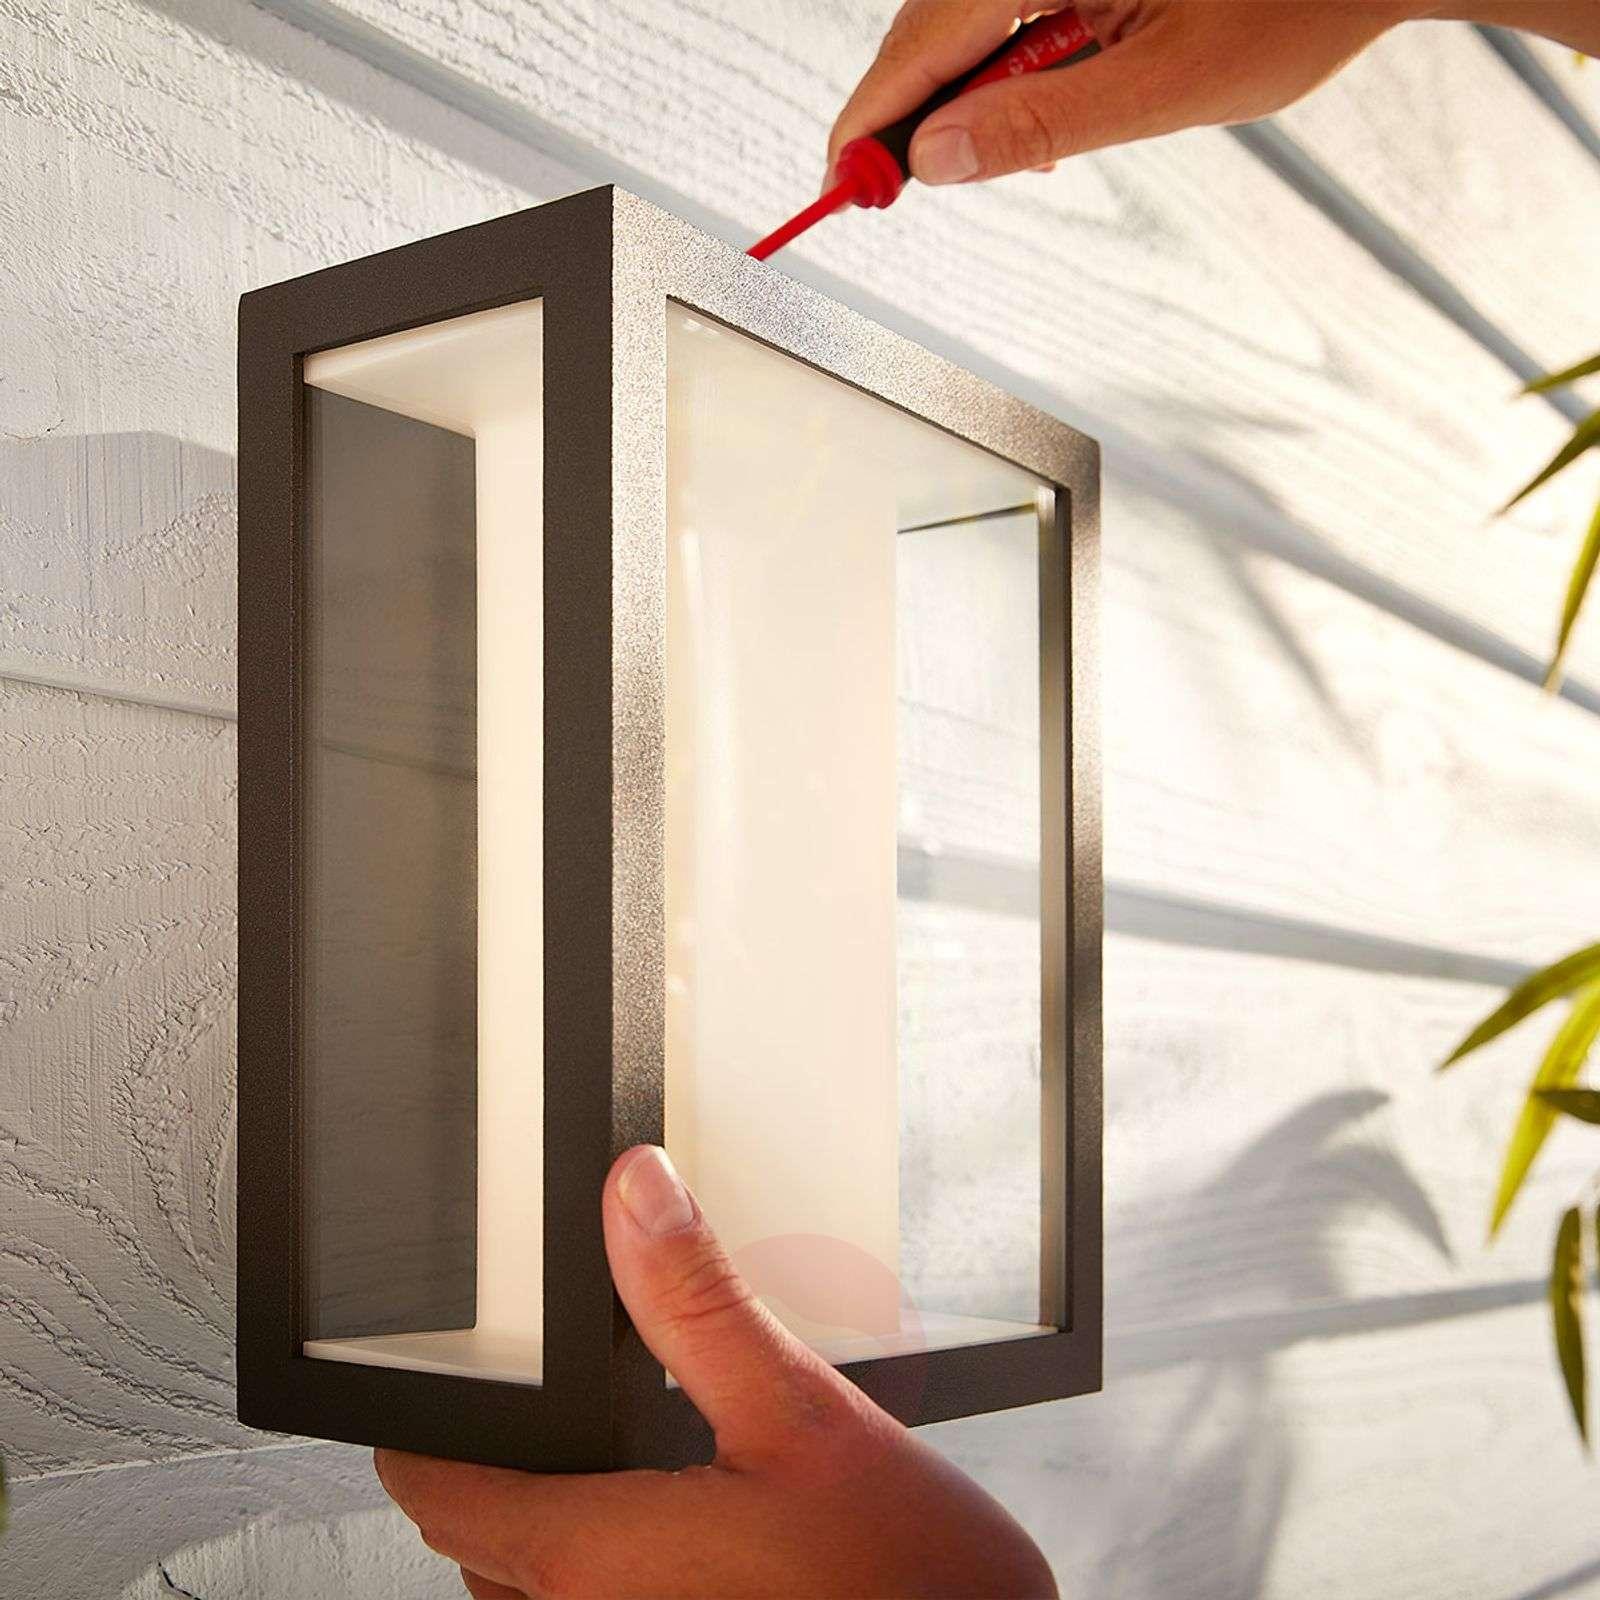 Philips Hue White+Color Impress seinävalo leveä-7534109-03